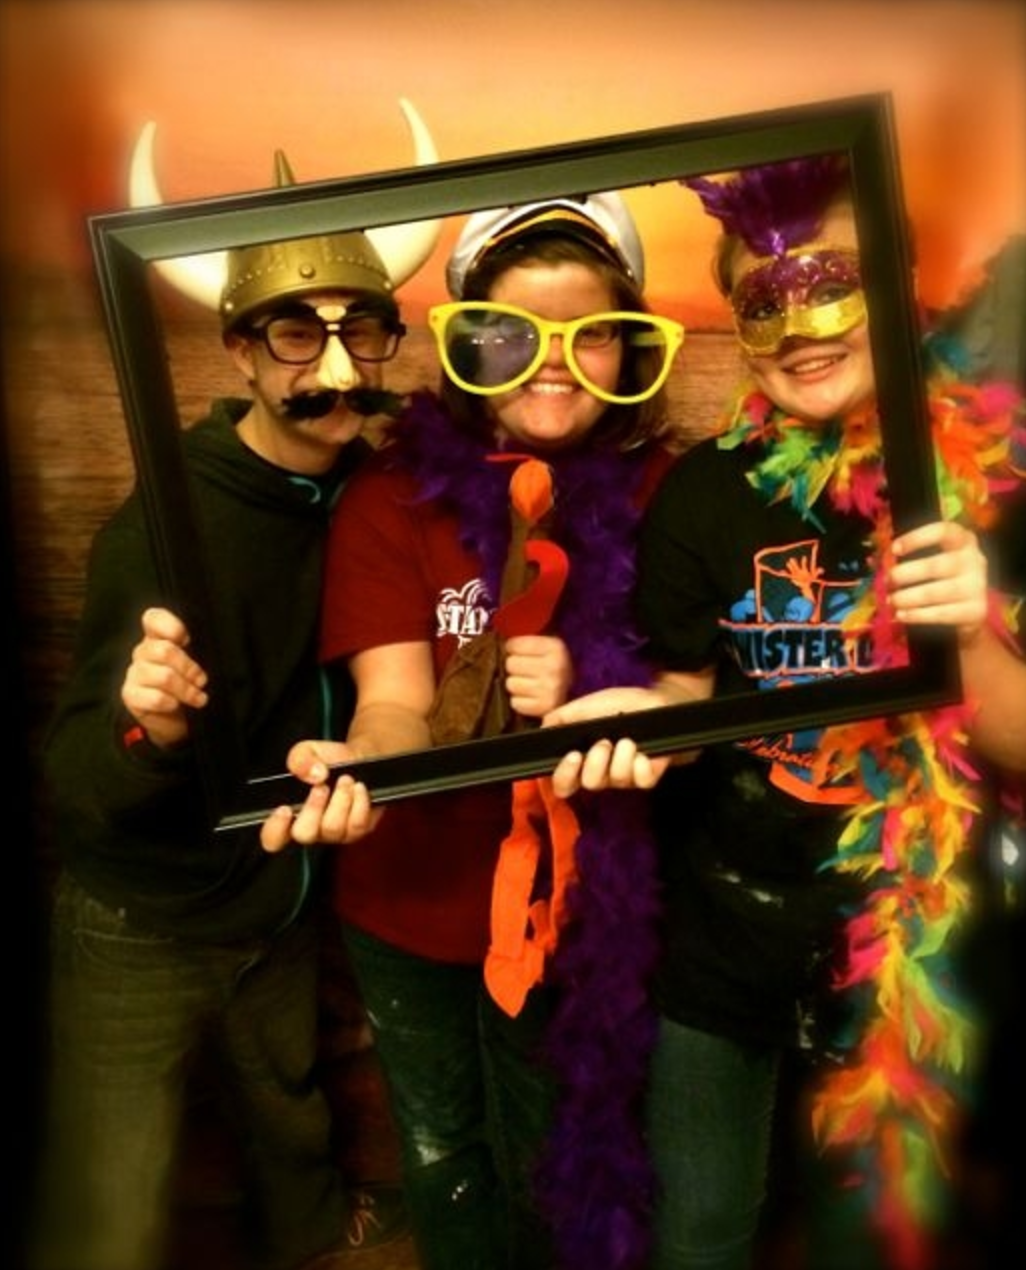 Inflatable Water Slide Rental Omaha: Selfie Photo Booth - Bounce Houses Omaha